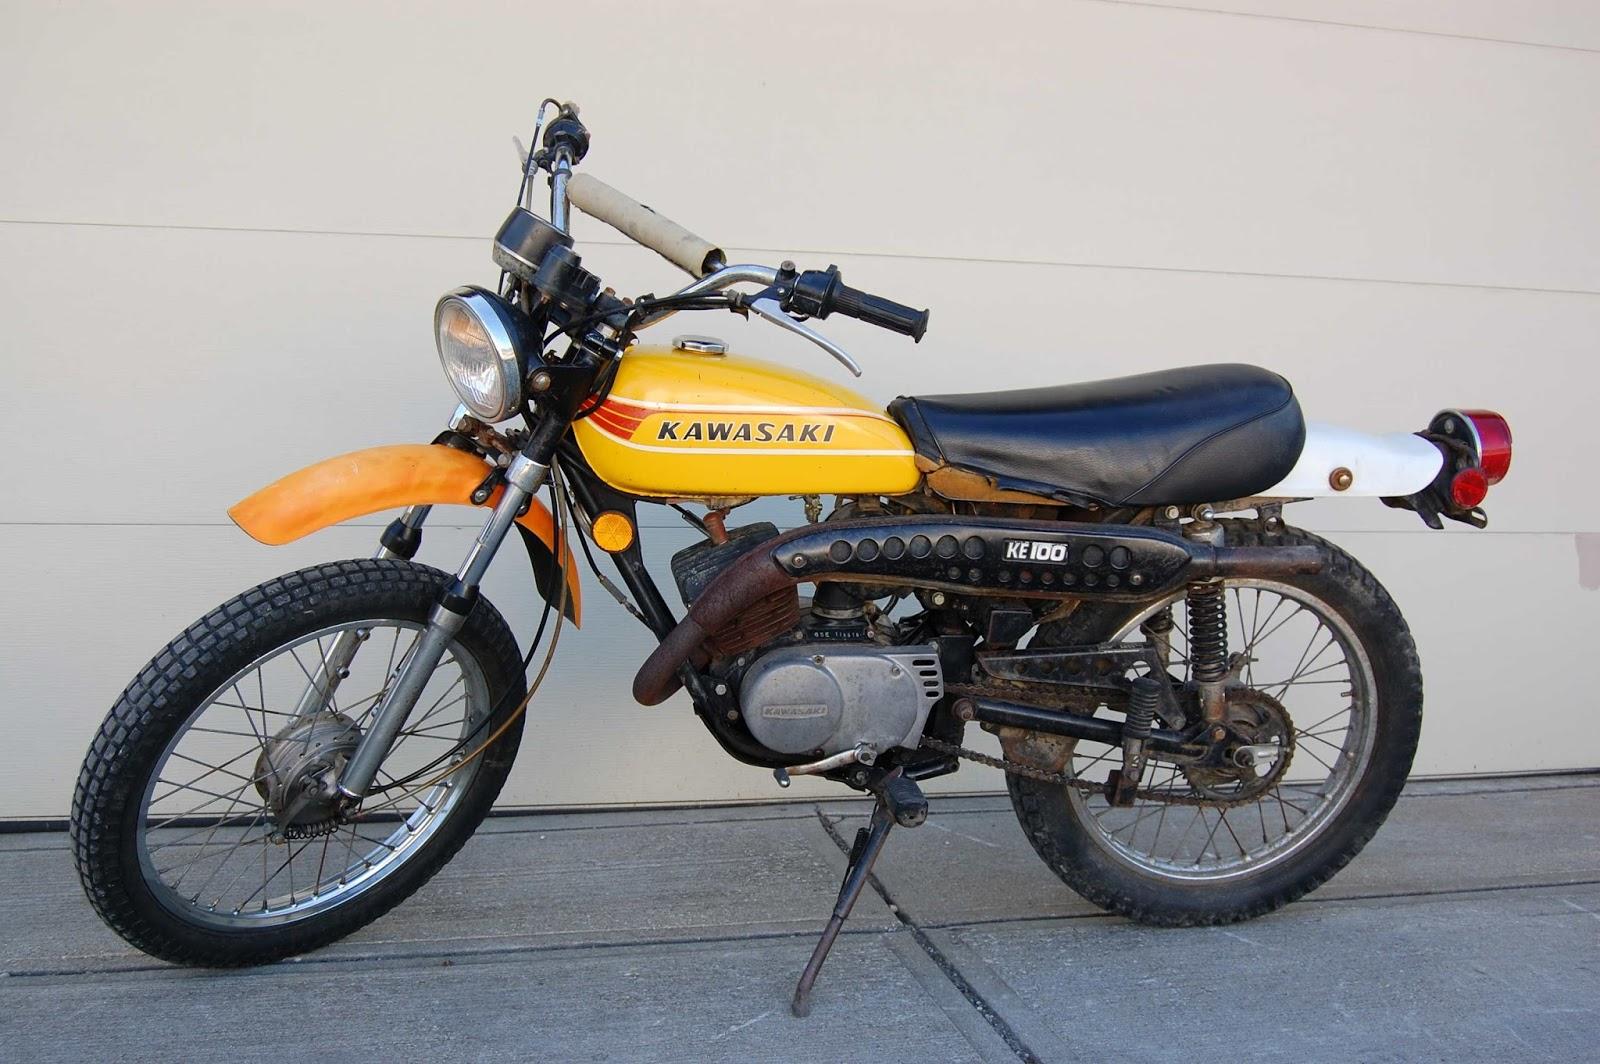 1987 Kawasaki Bayou 300 Wiring Diagram Molex To 6 Pin Ke 100 Greenstreak ~ Elsavadorla